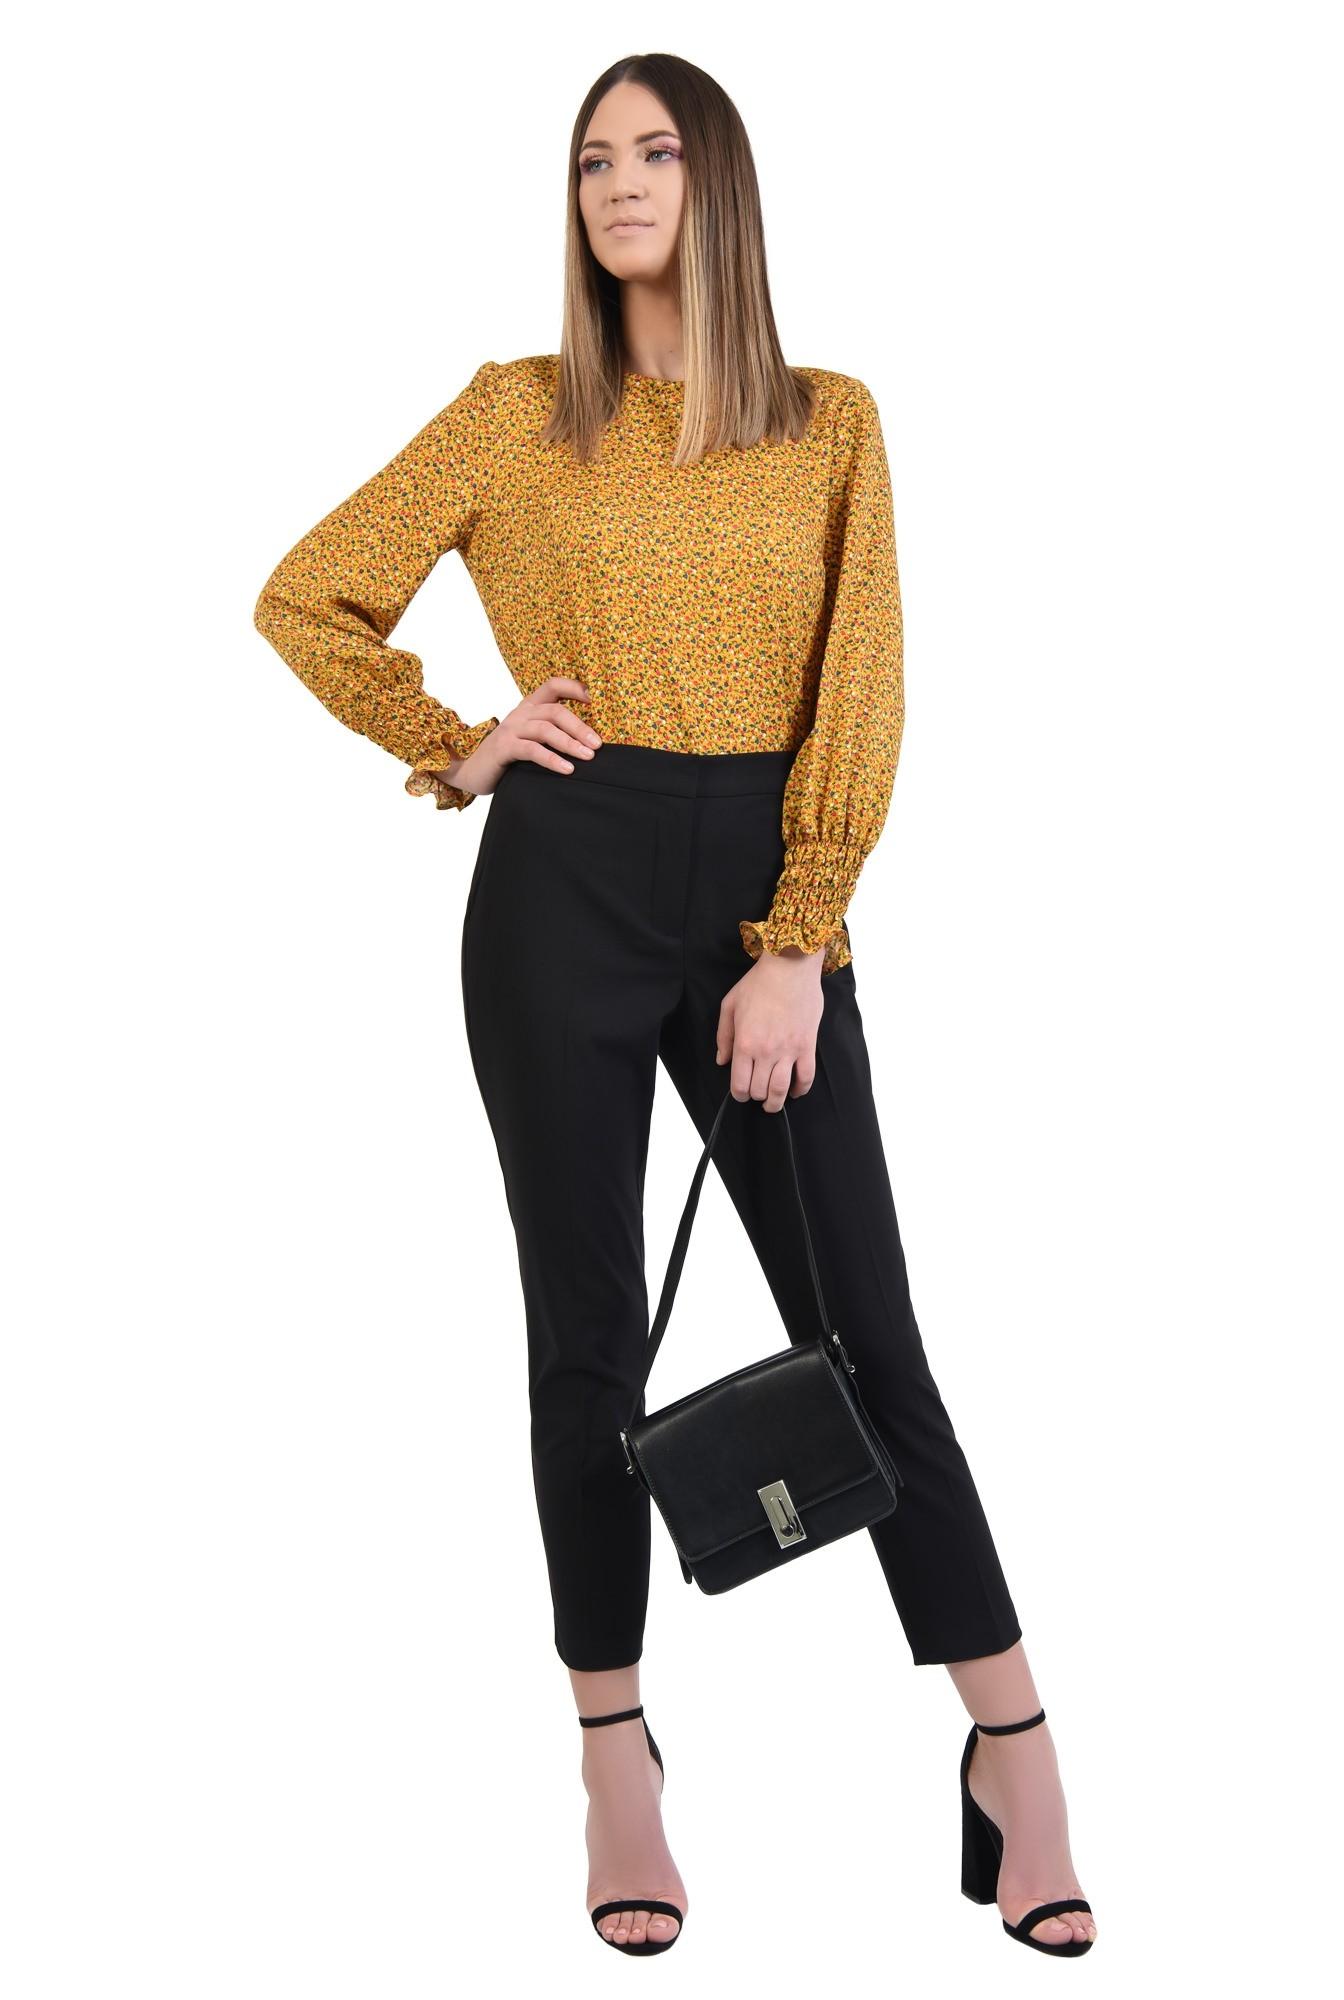 360 - bluza casual, din viscoza imprimata, maneci lungi cu mansete elastice